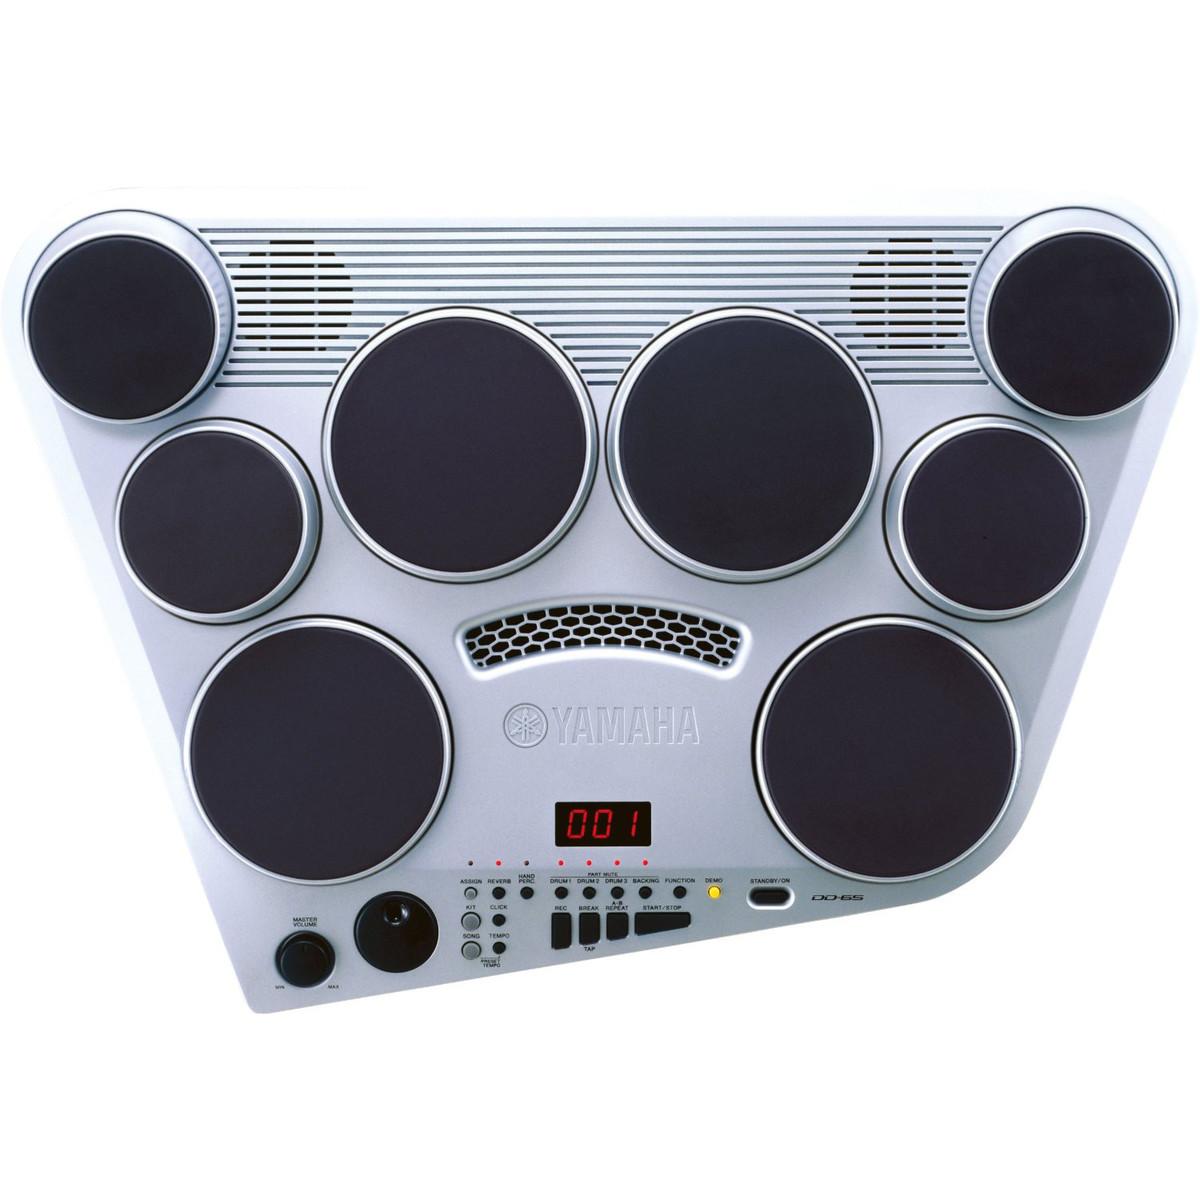 Yamaha dd65 electronic drum pads b stock at for Yamaha drum pads